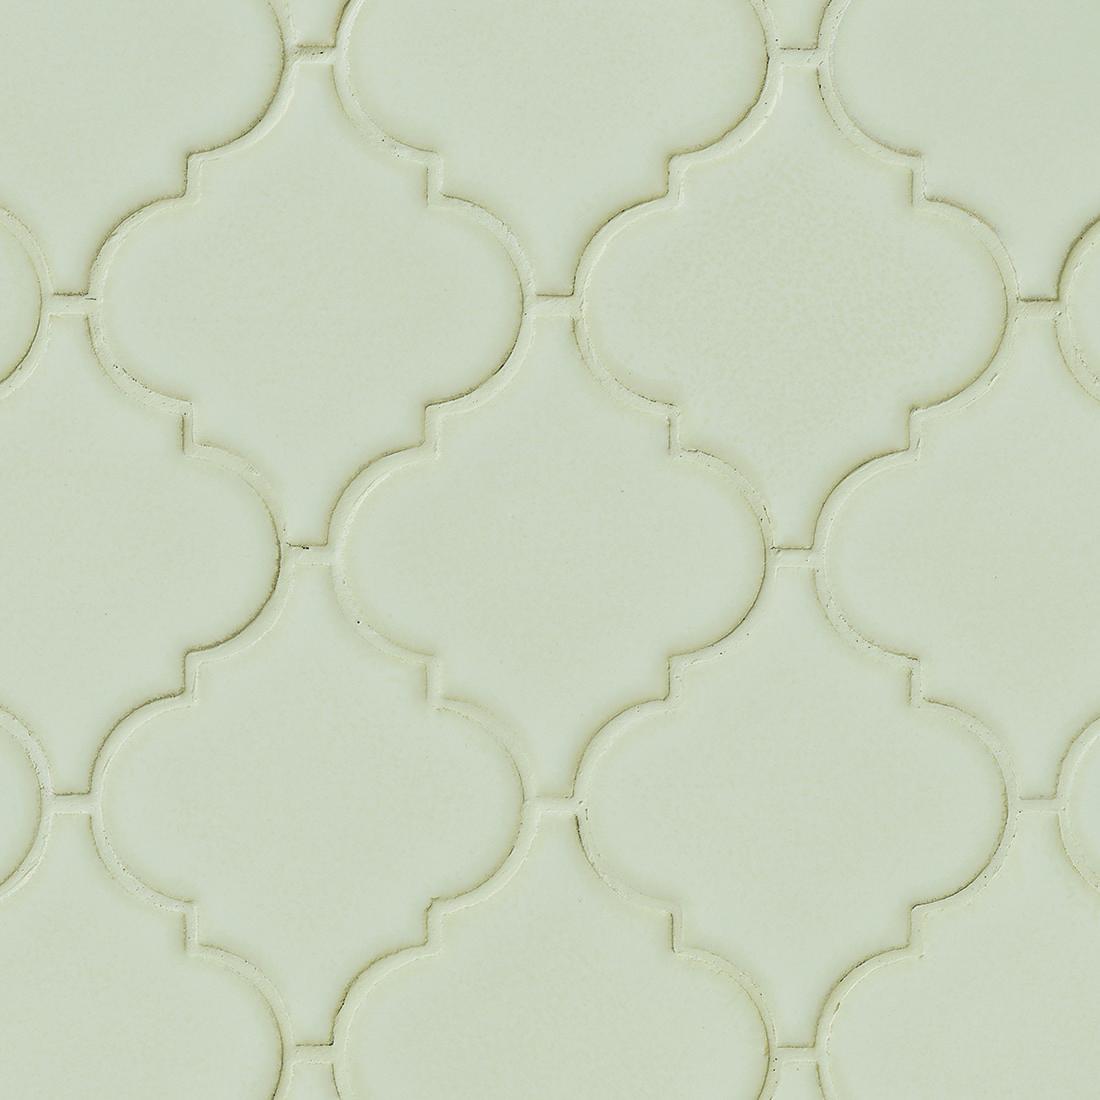 Arabesque 8mm / Pattern / Glossy Ceramic Tile - Antique White 0